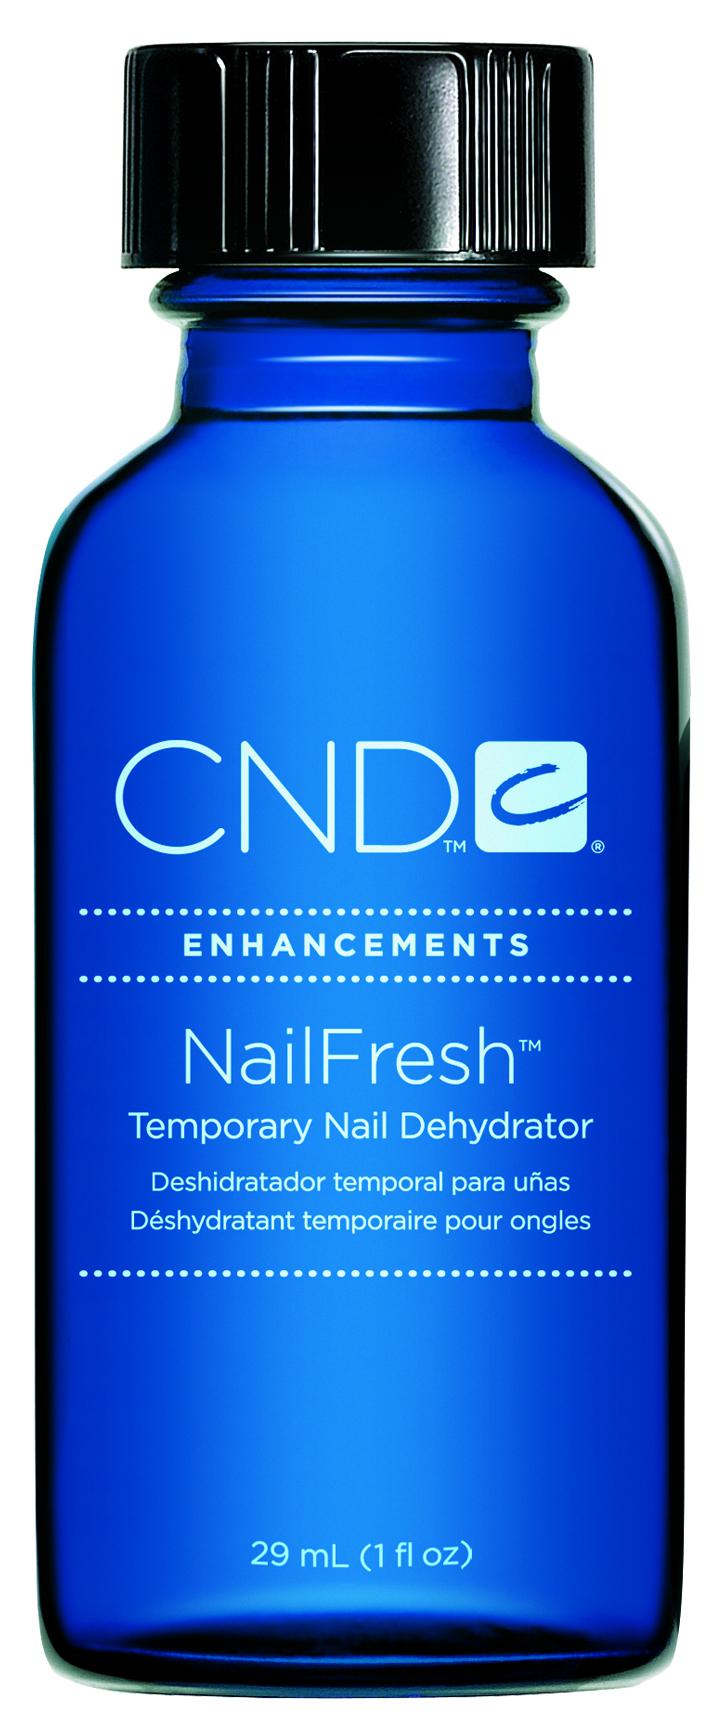 CND Препарат для краткосрочной дегидратации / Nail Fresh 29мл